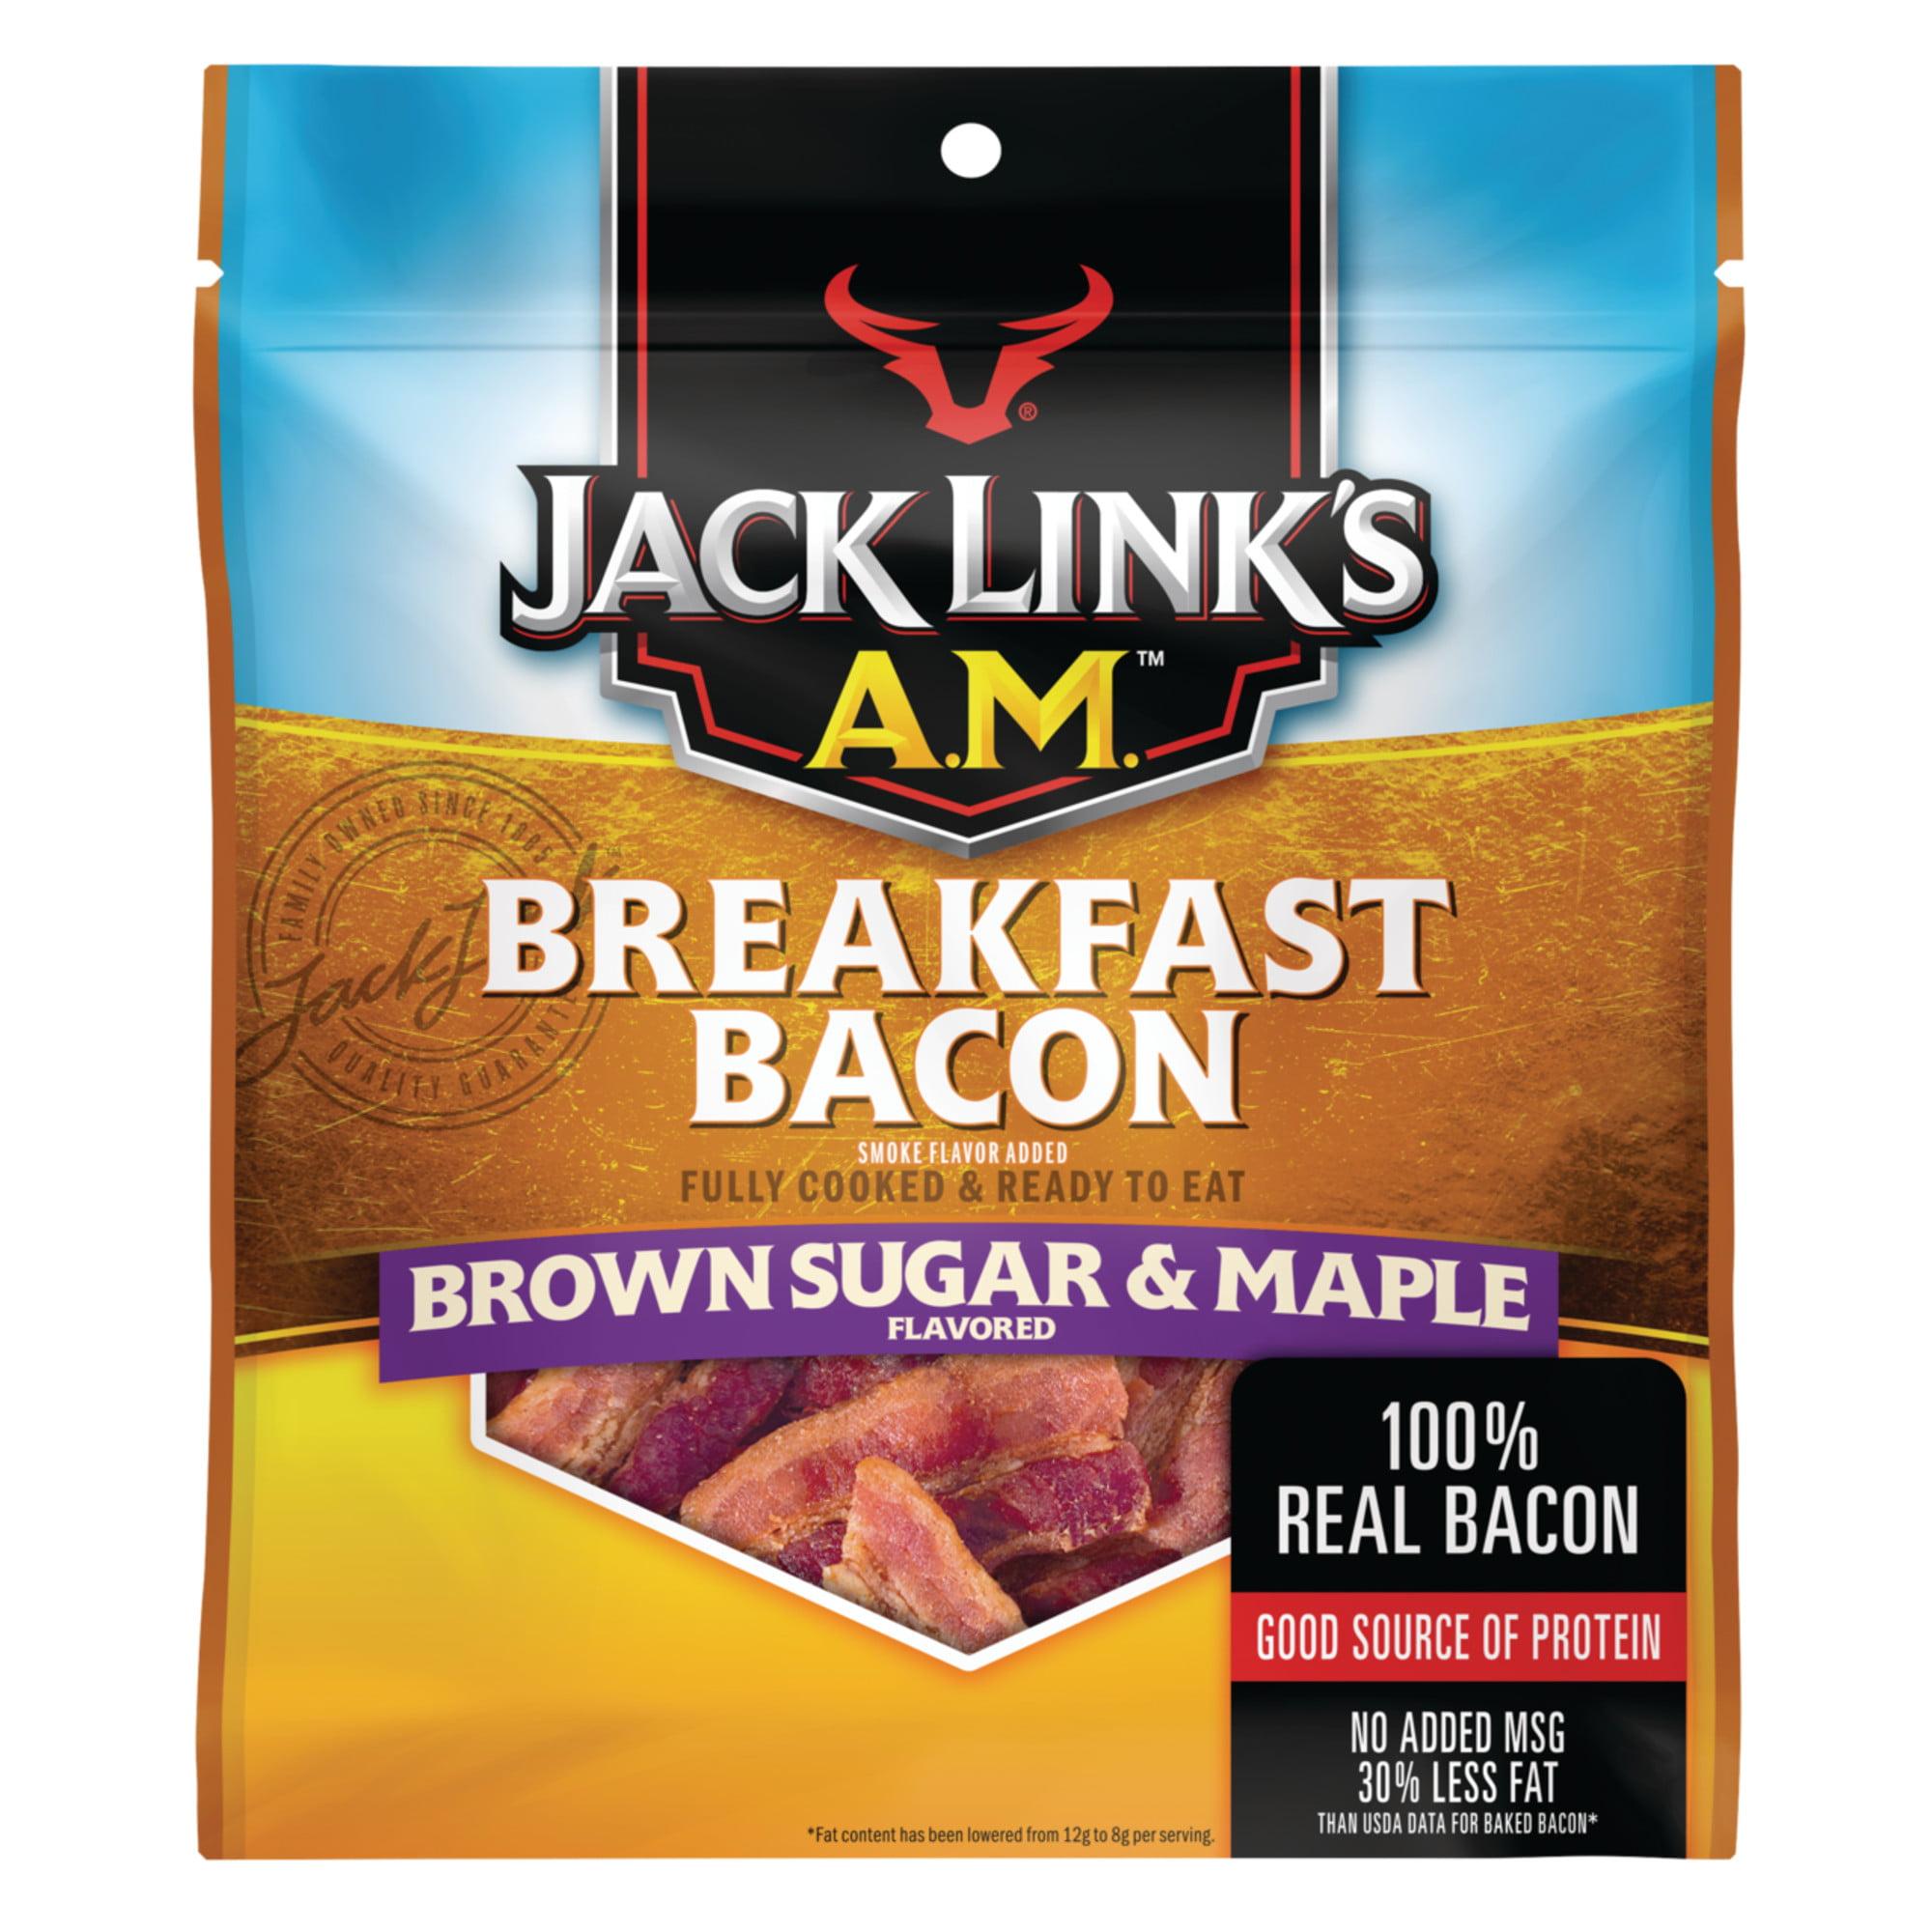 Jack Links AM Breakfast Bacon, Brown Sugar & Maple, 2.5oz